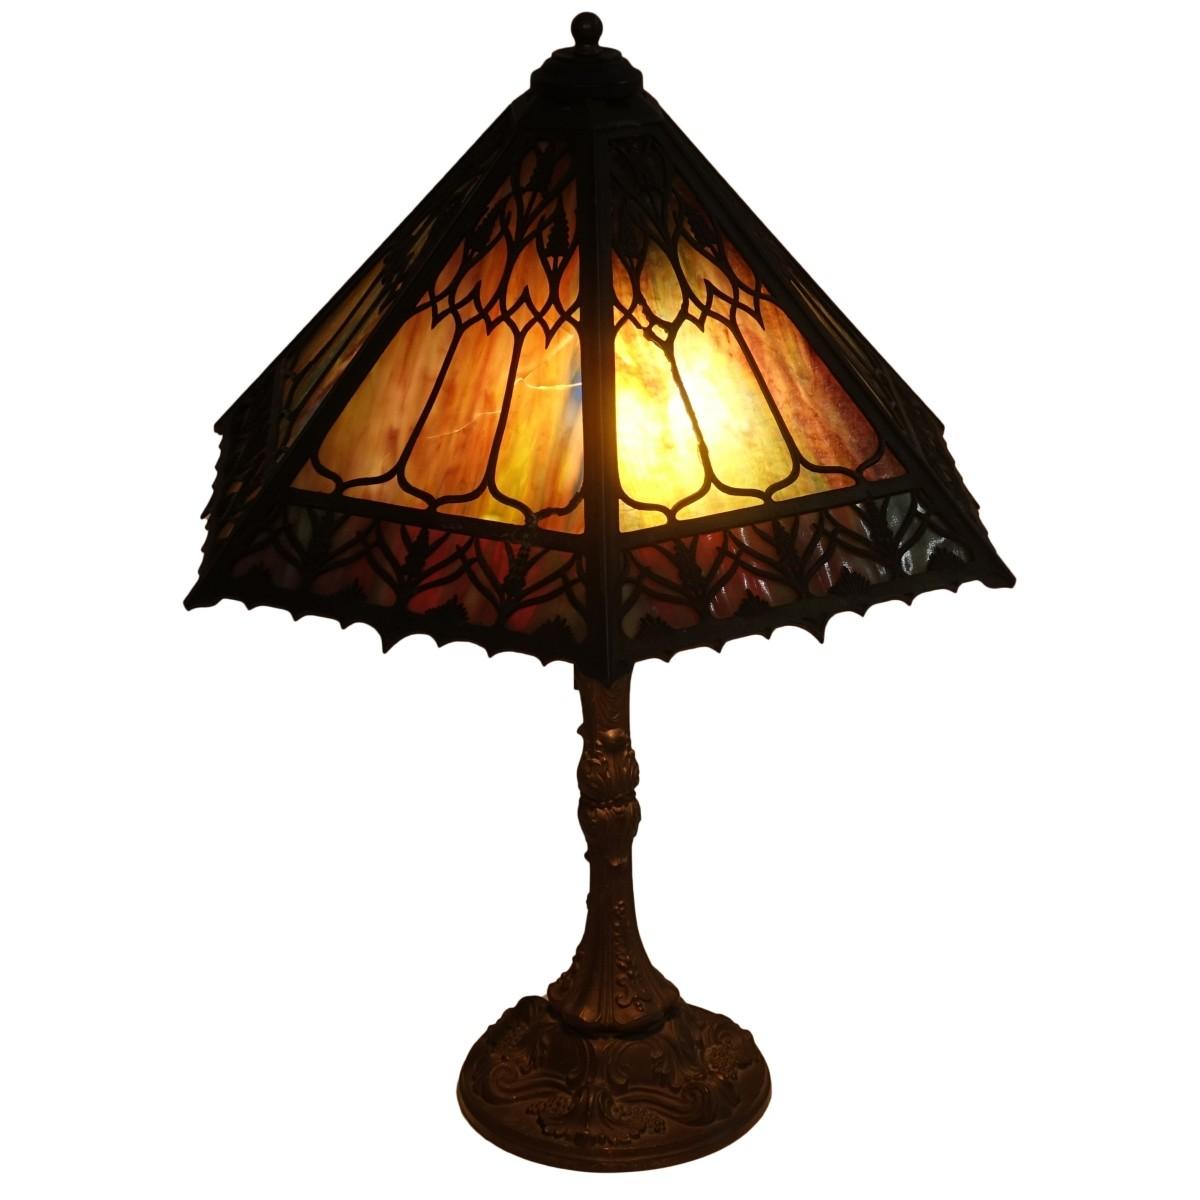 H.A. Best & Company Slag Glass Lamp